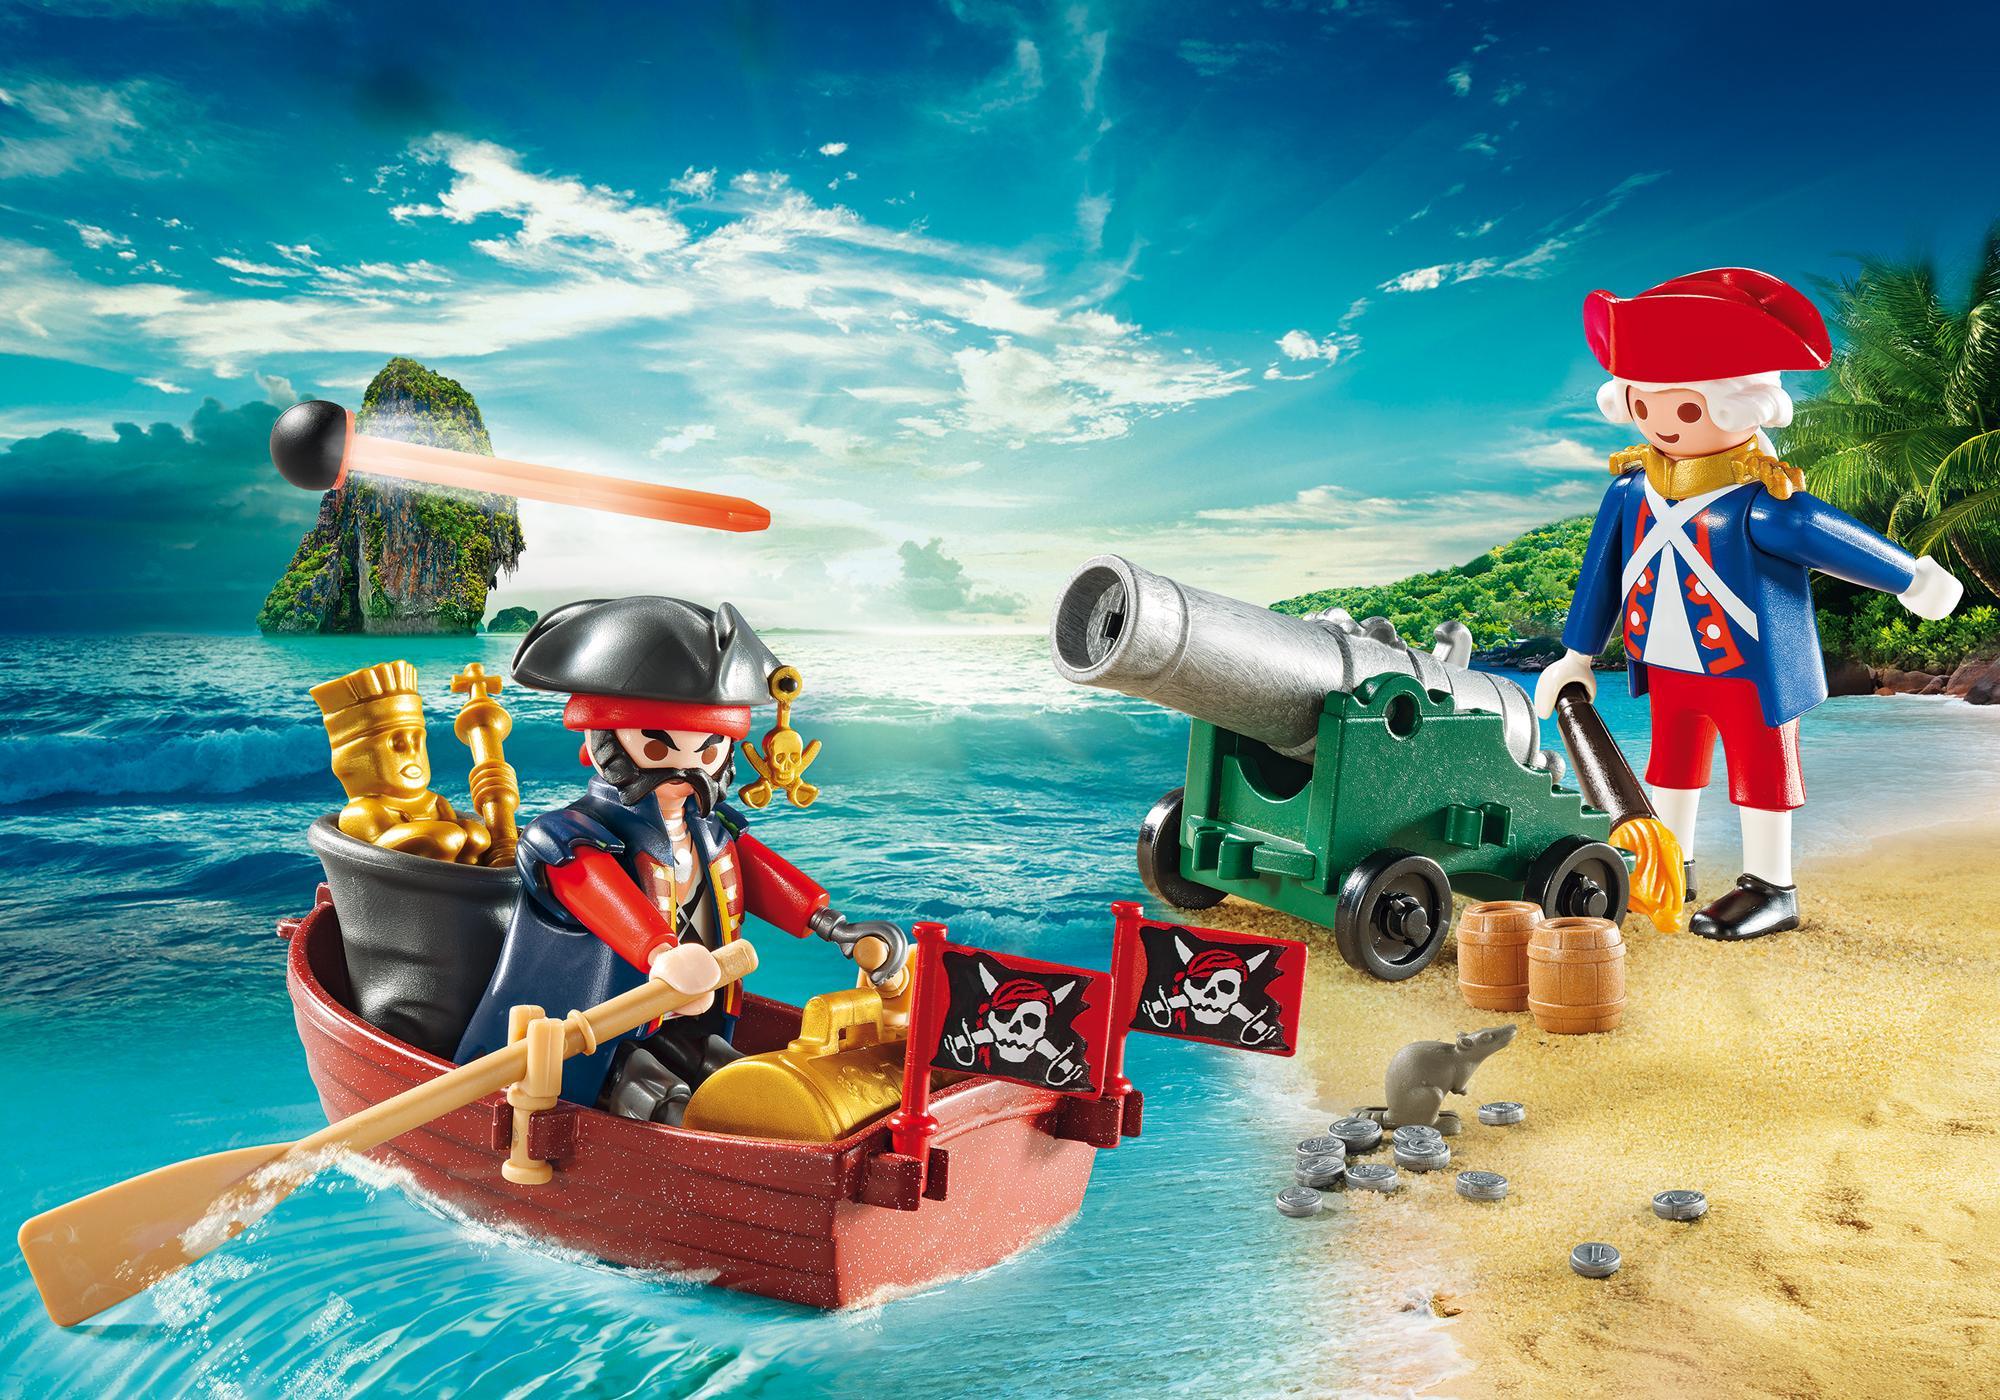 http://media.playmobil.com/i/playmobil/9102_product_detail/Pirate Raider Carry Case